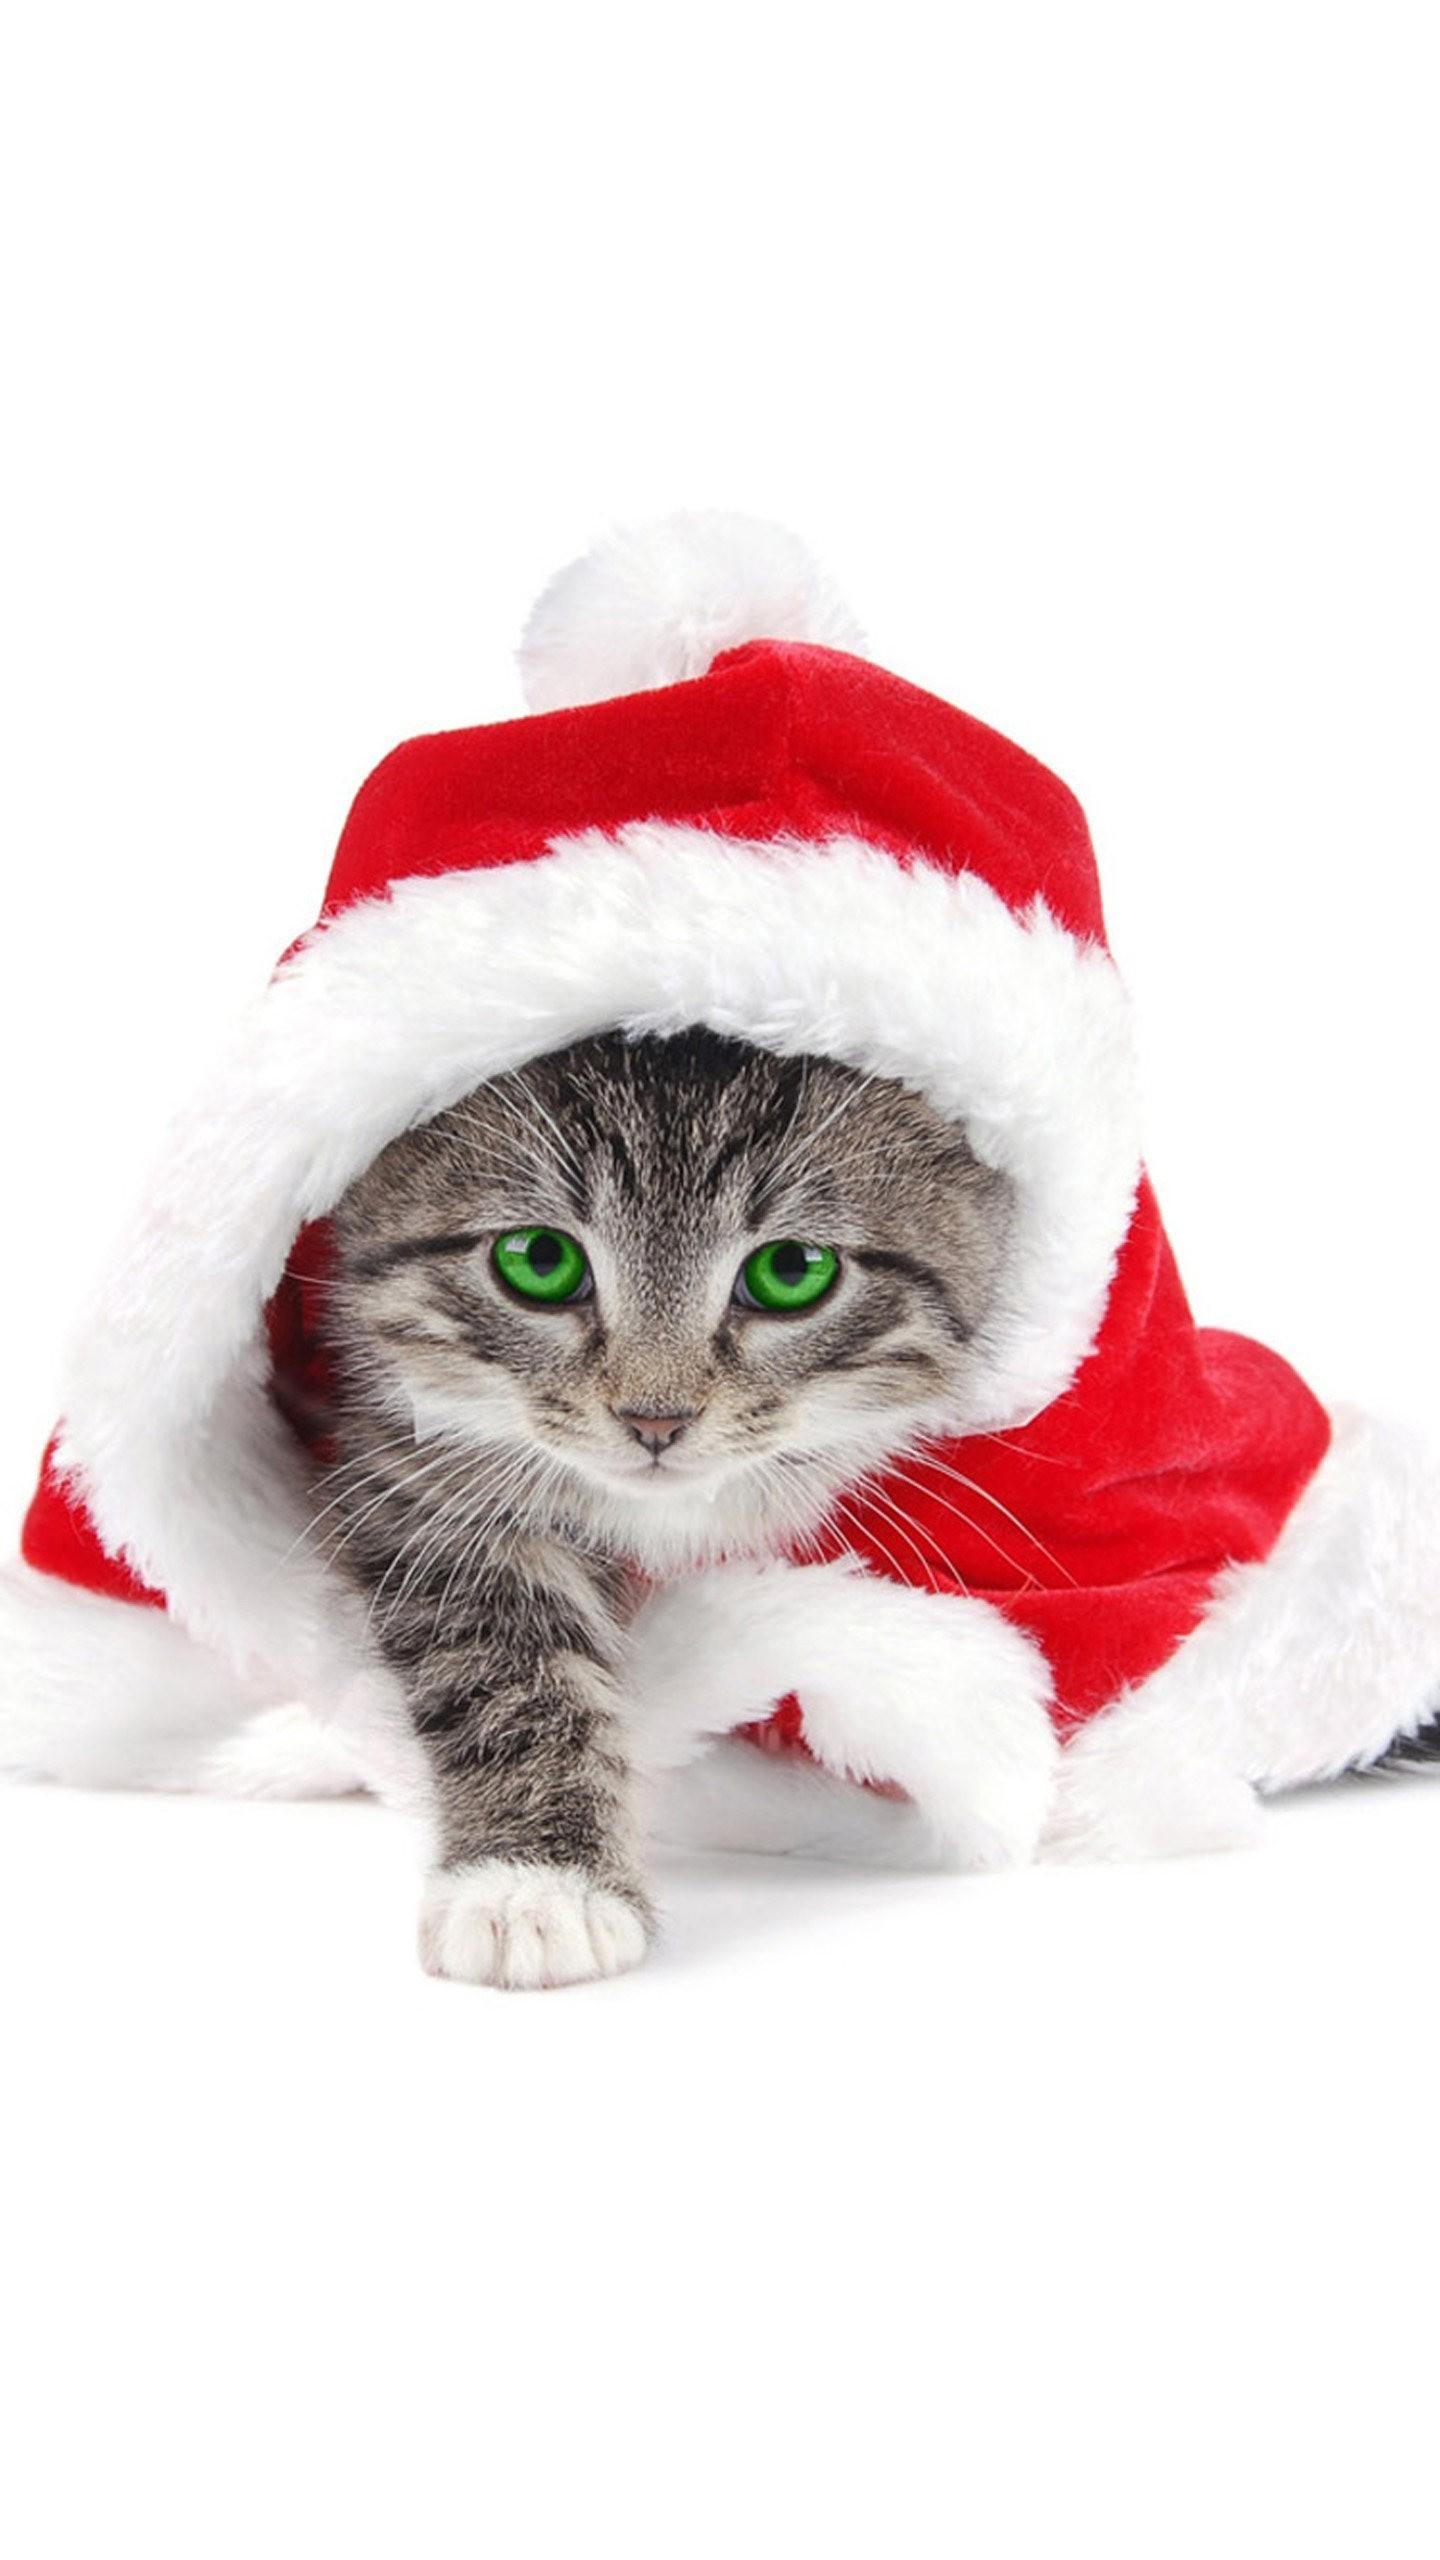 Res: 1440x2560, Christmas Cat Wallpaper. Galaxy S7